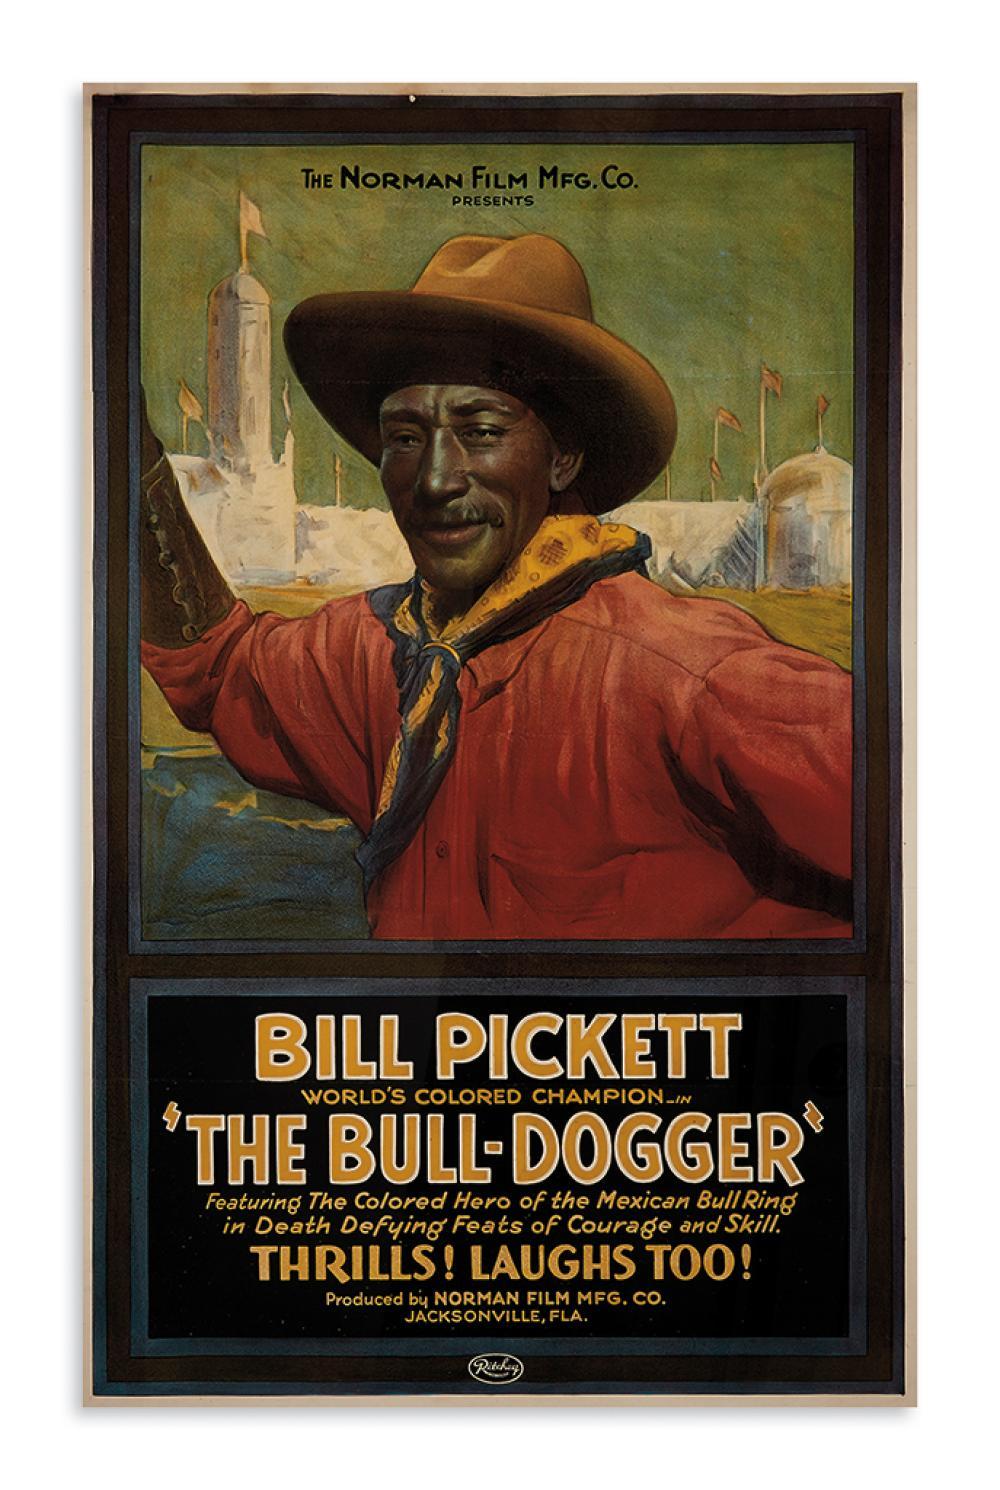 "(FILM.) Norman Film Manufacturing Company. Bill Pickett, World's Colored Champion, in ""The Bull-Dogger."""